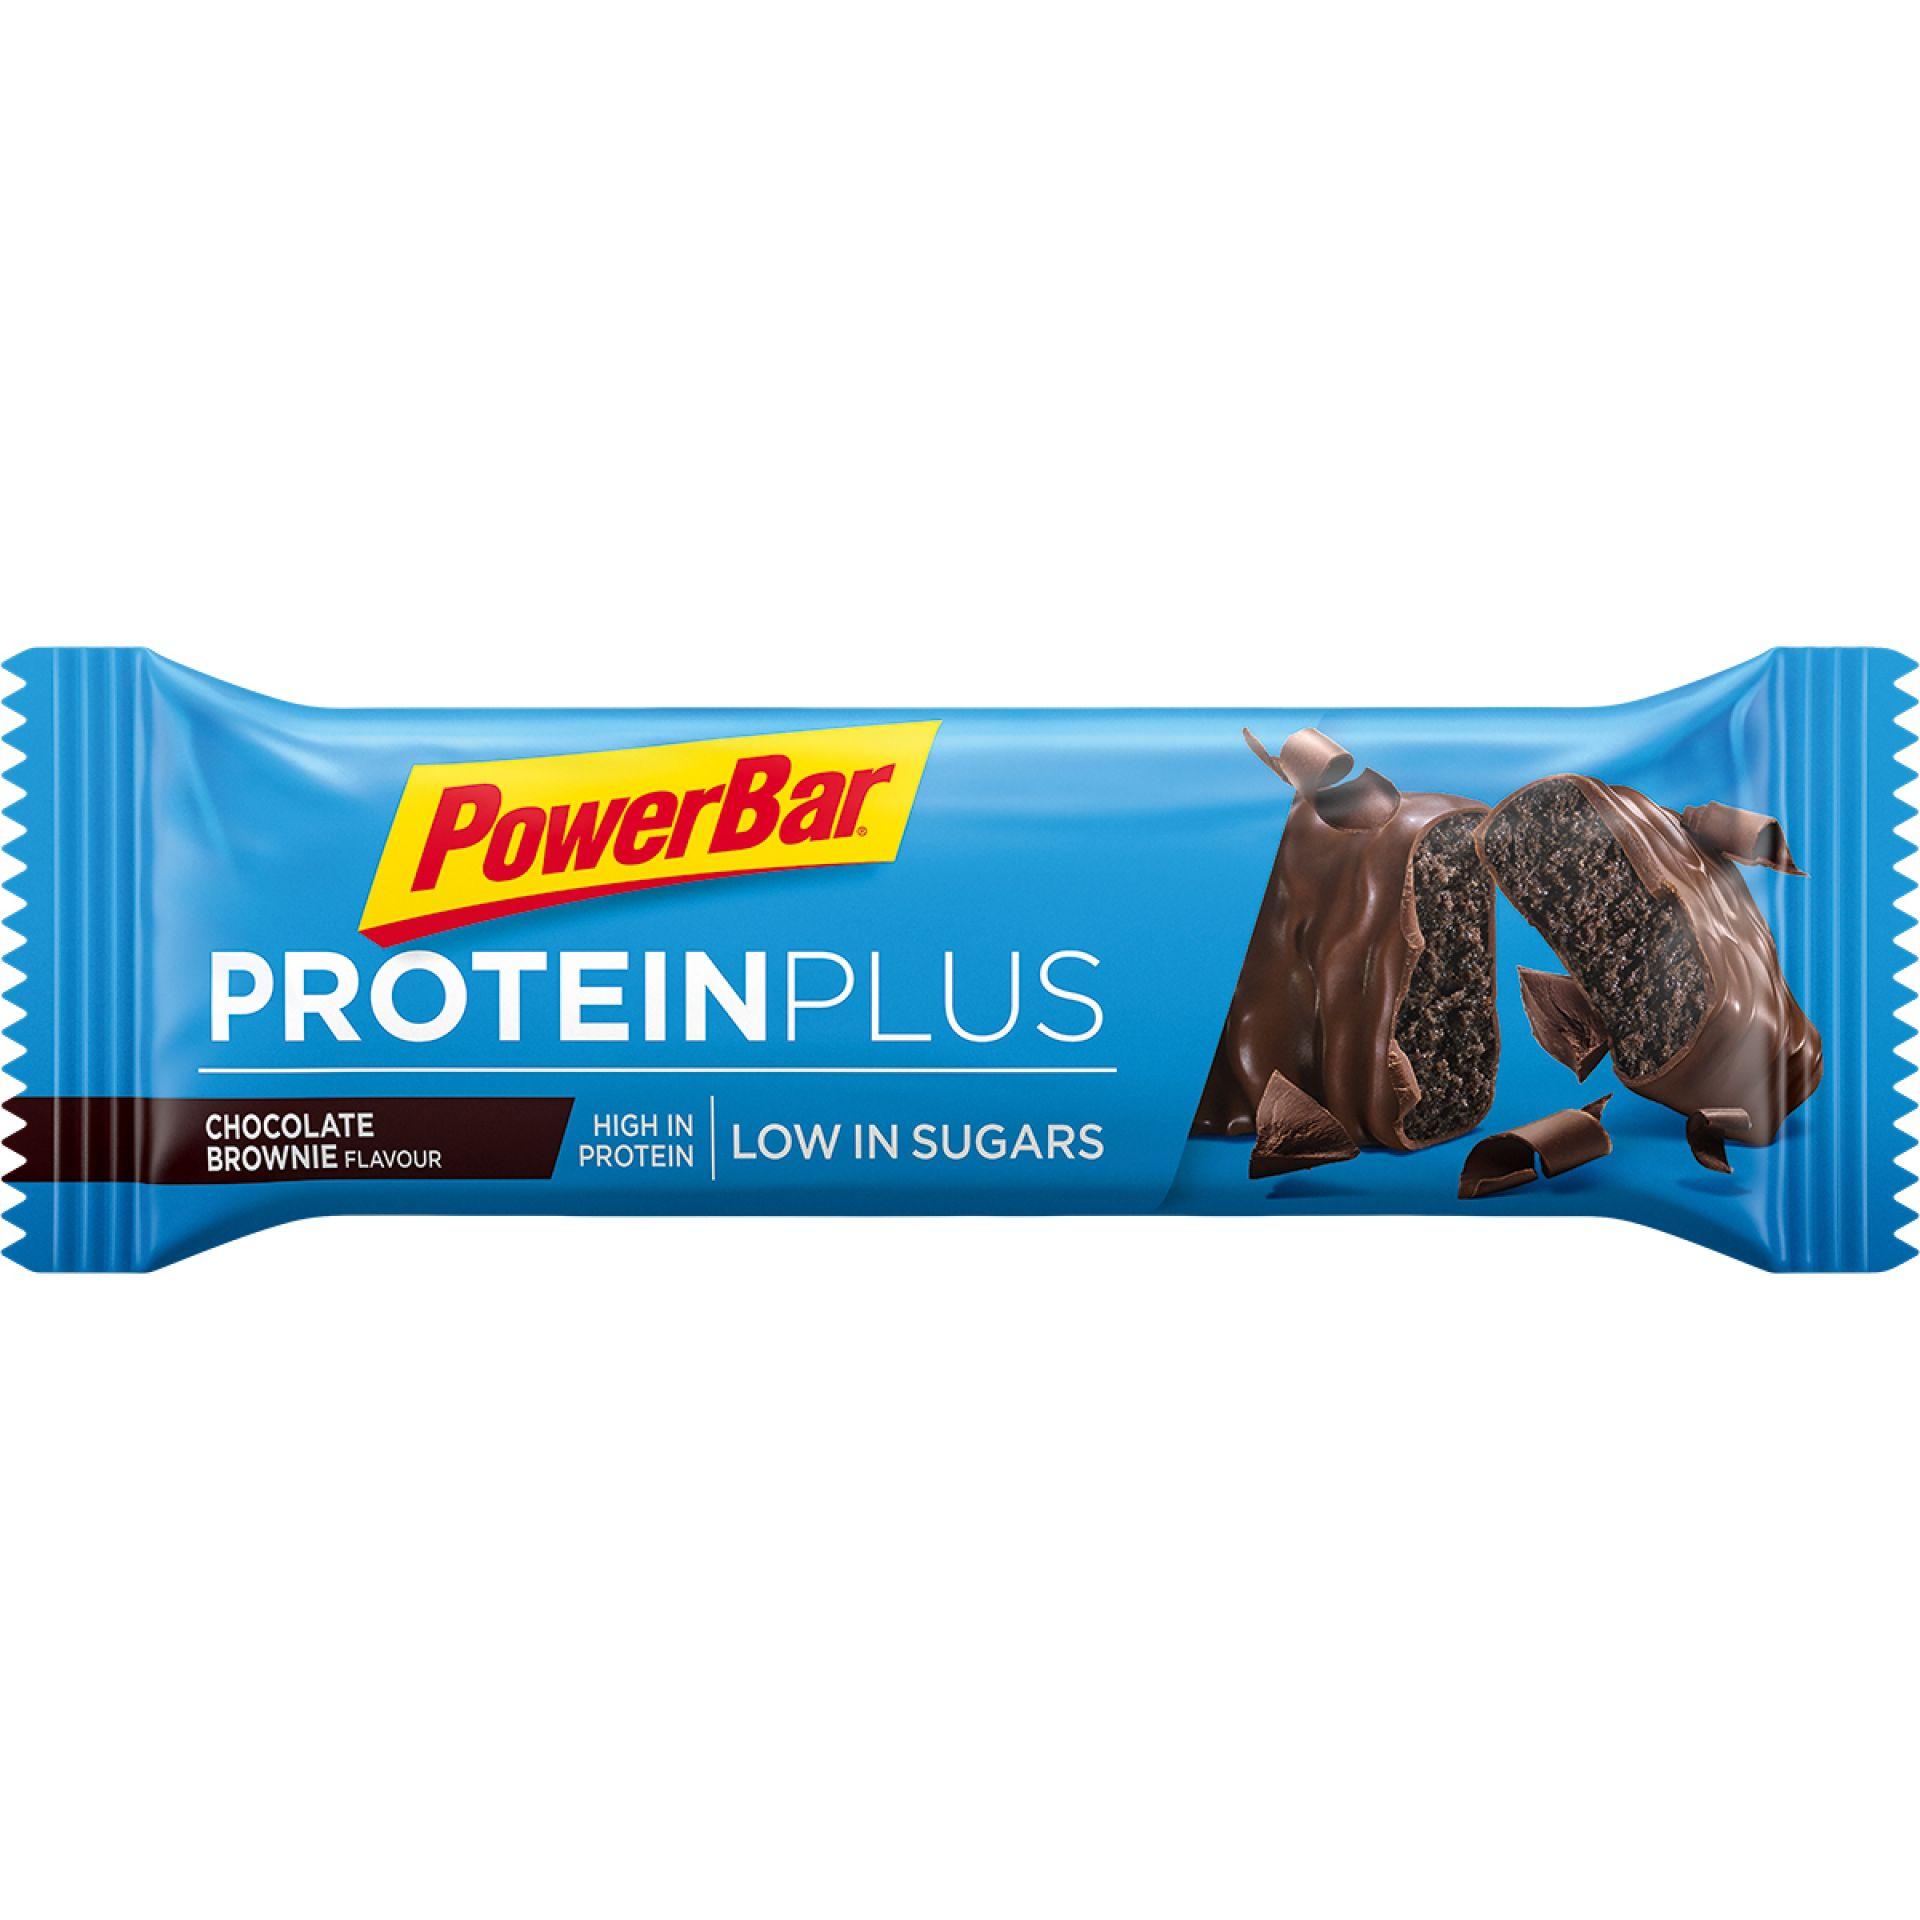 PowerBar Protein Plus Low Sugar Chocolate Brownie (35g)